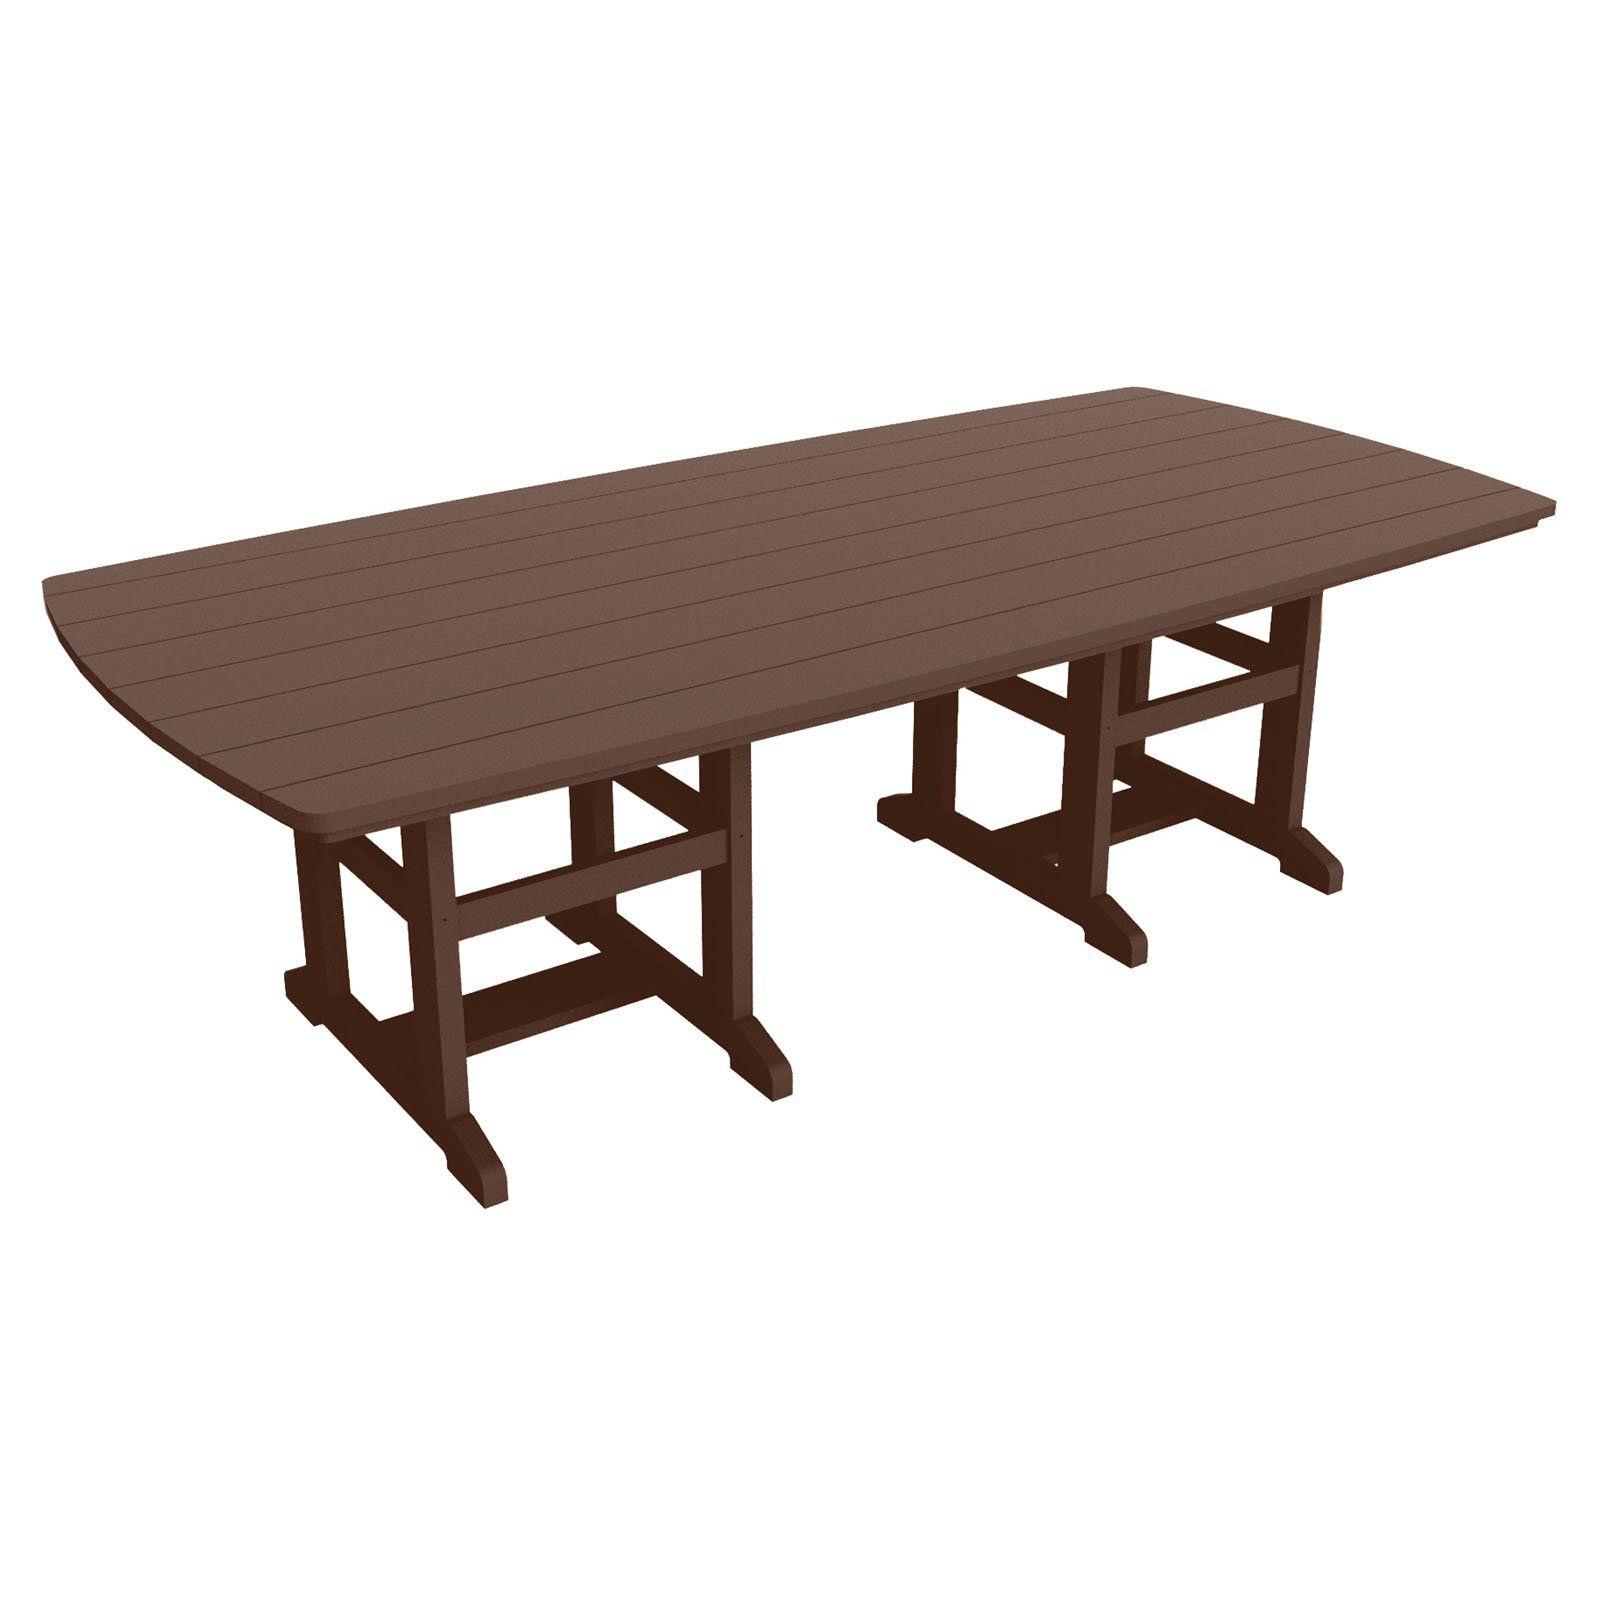 Terrific Outdoor Pawleys Island Hammocks Durawood 8 Ft Patio Dining Andrewgaddart Wooden Chair Designs For Living Room Andrewgaddartcom